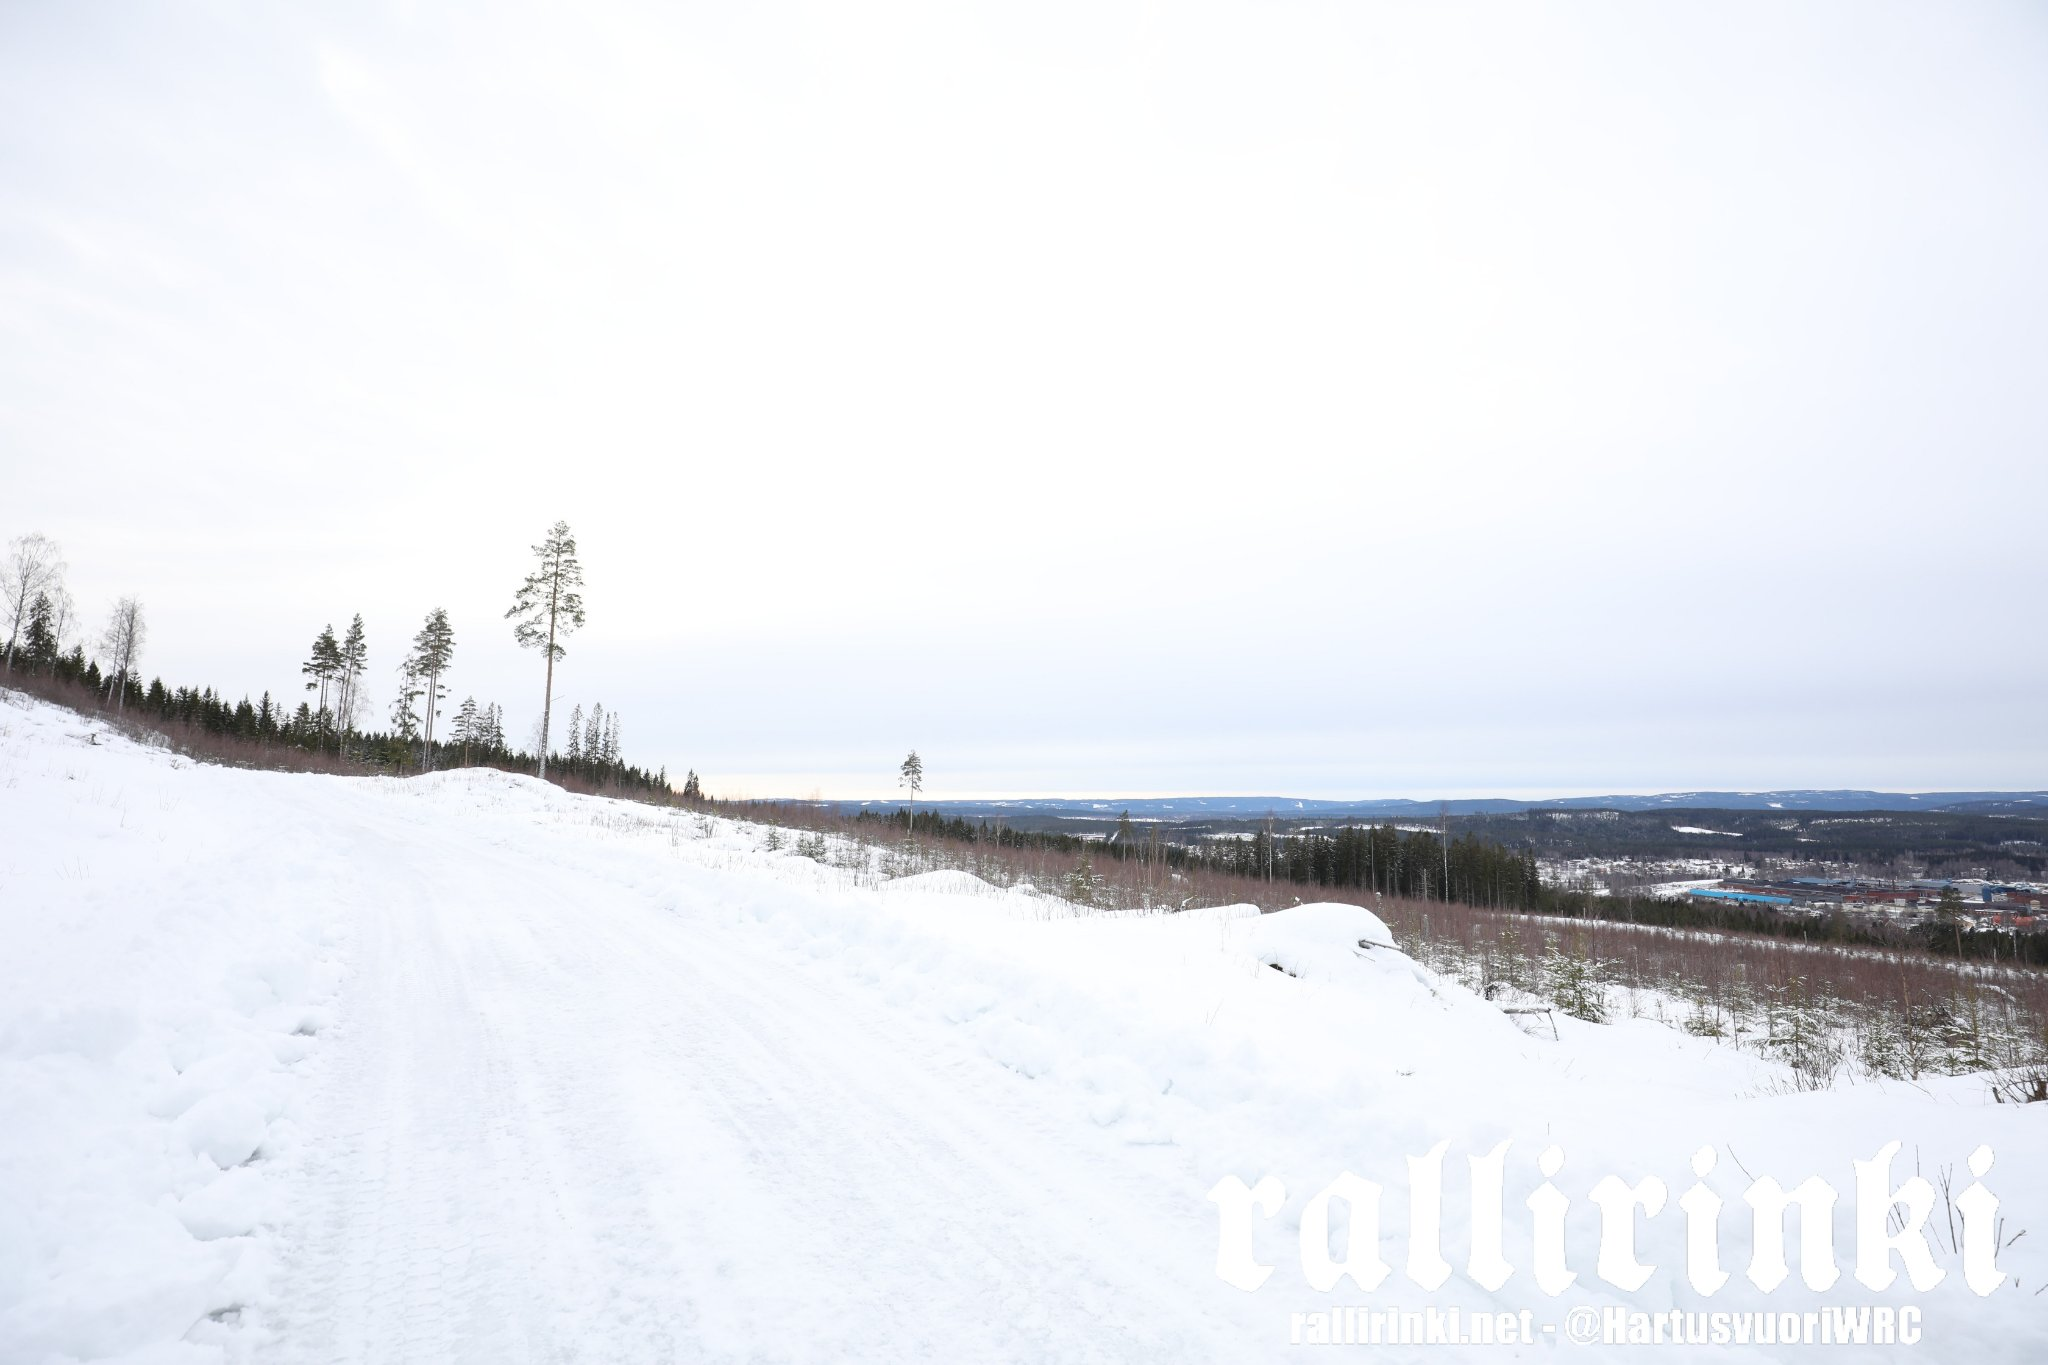 WRC: 67º Rallye Sweden [14-17 Febrero] - Página 2 DzNpxHqUwAA5i5a